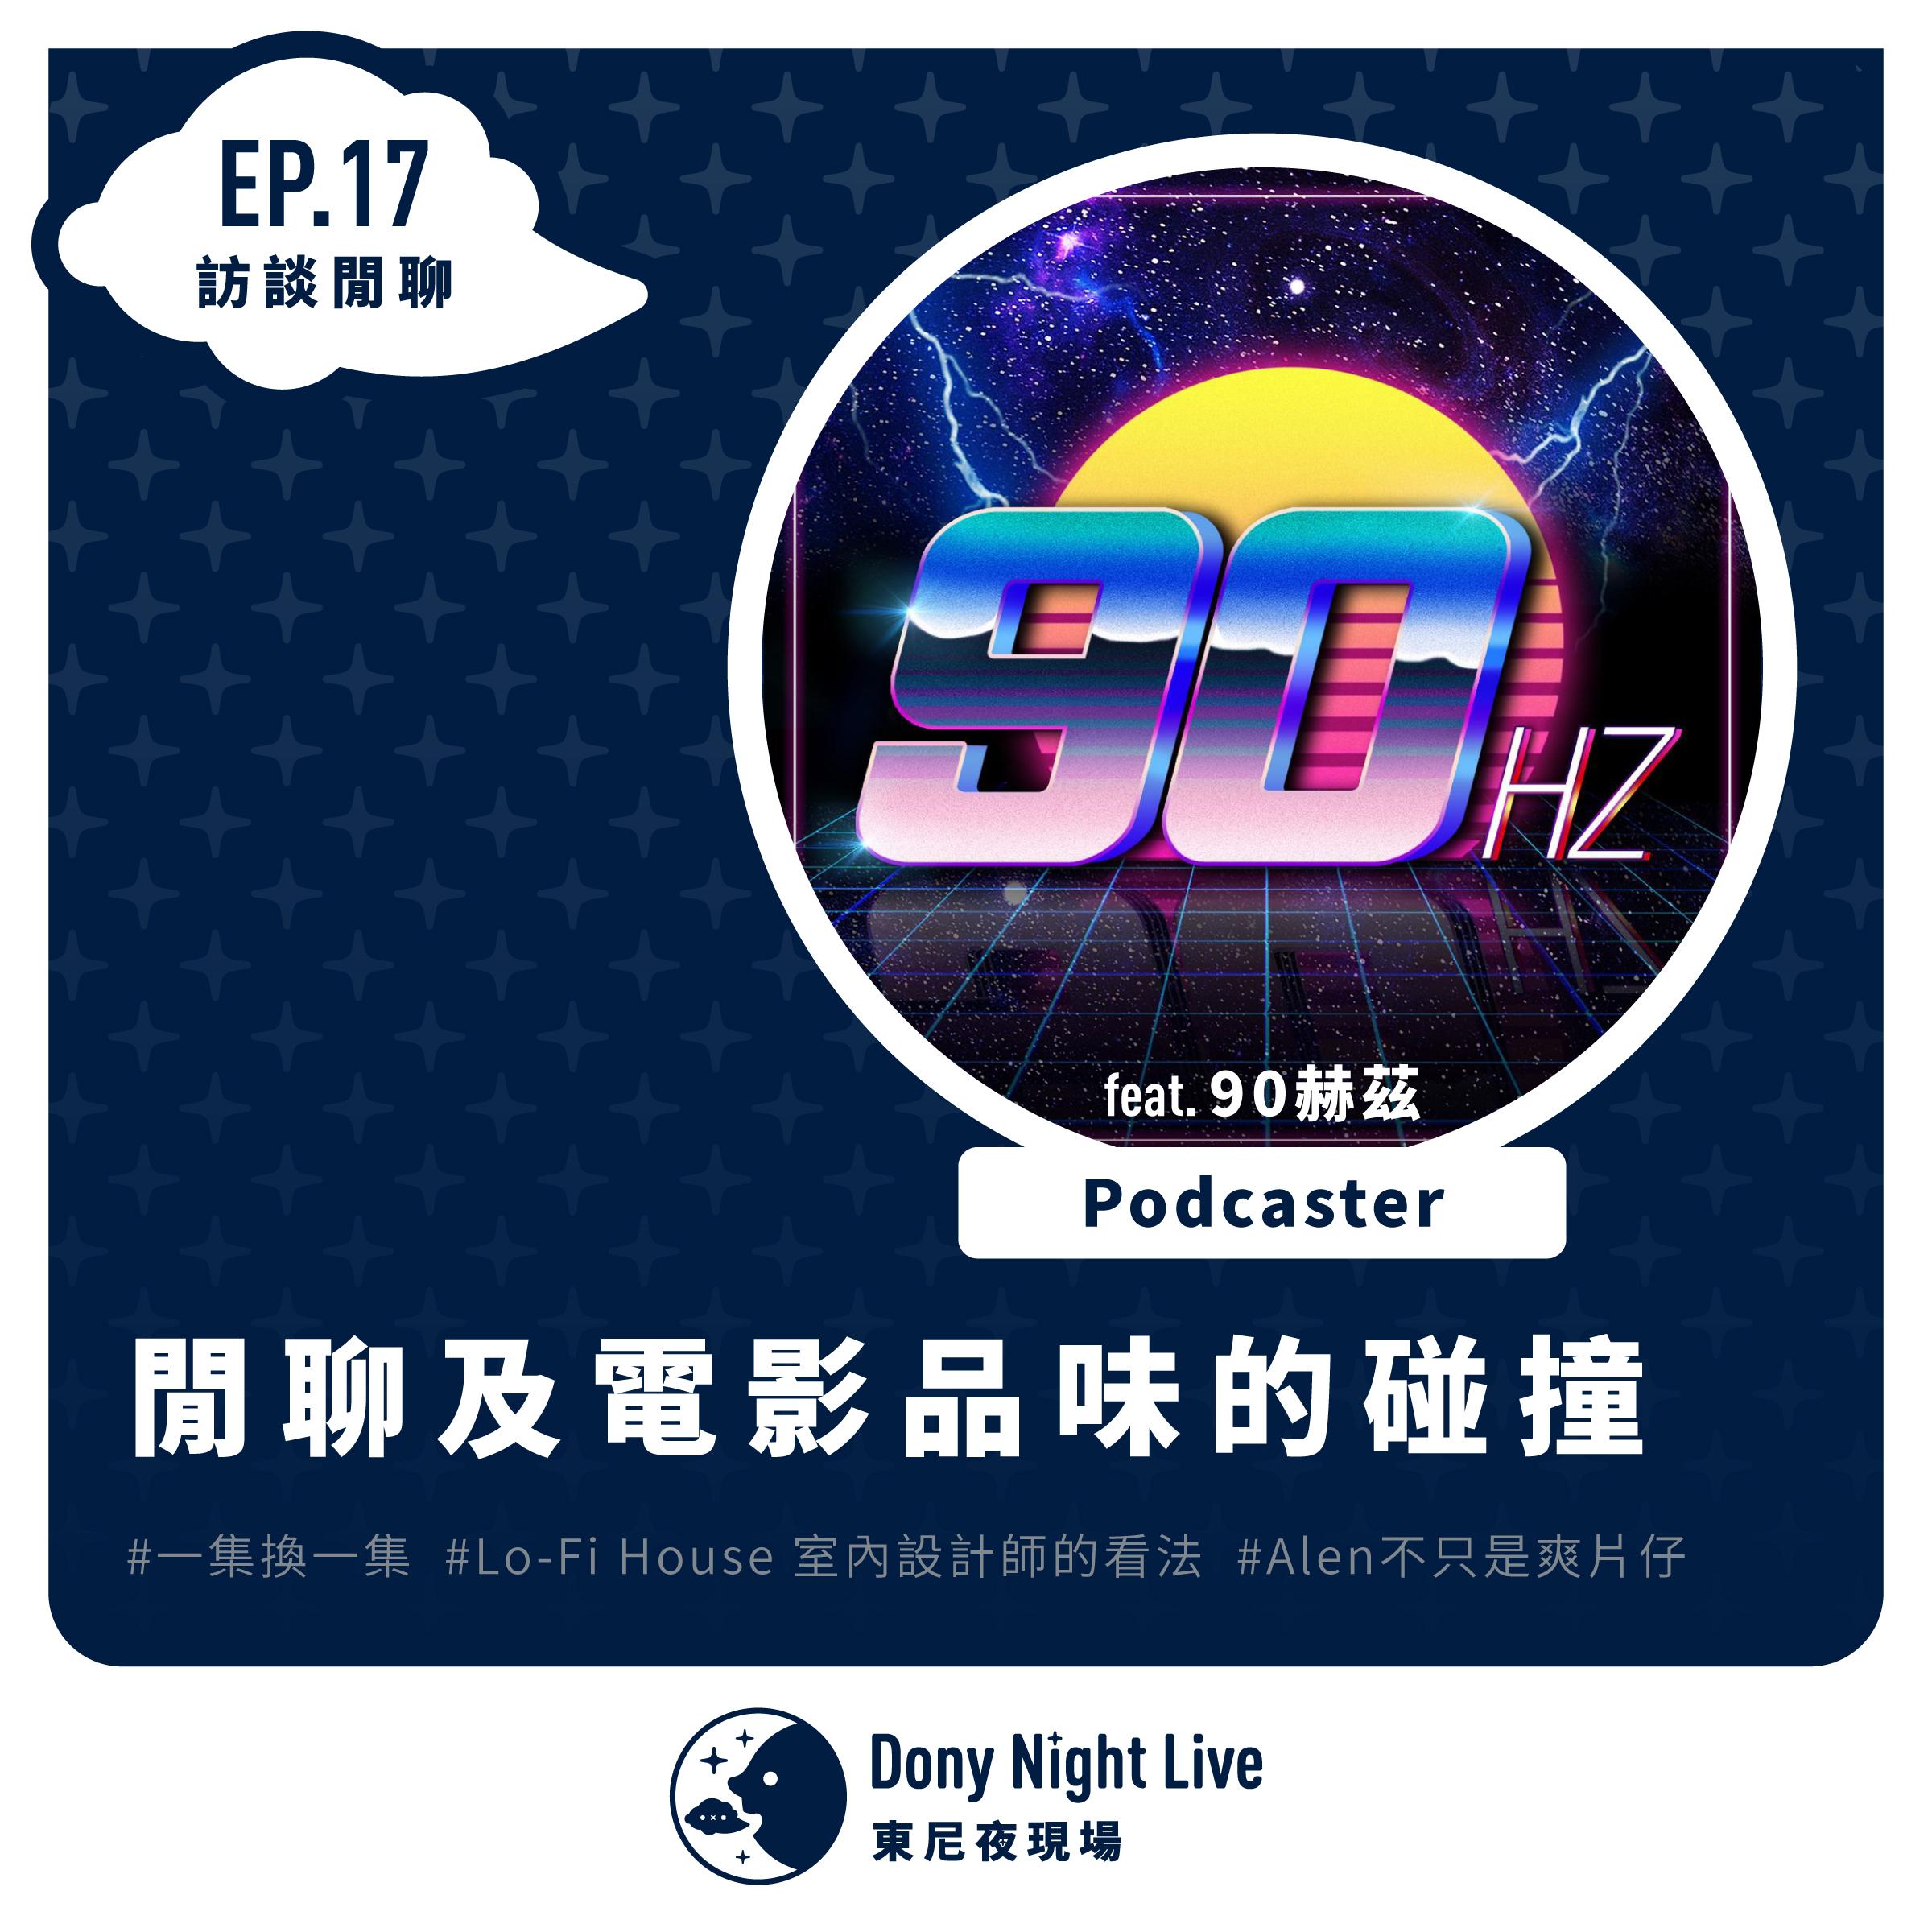 EP17【訪談閒聊】Podcaster / 閒聊及電影品味的碰撞 ft.90赫茲